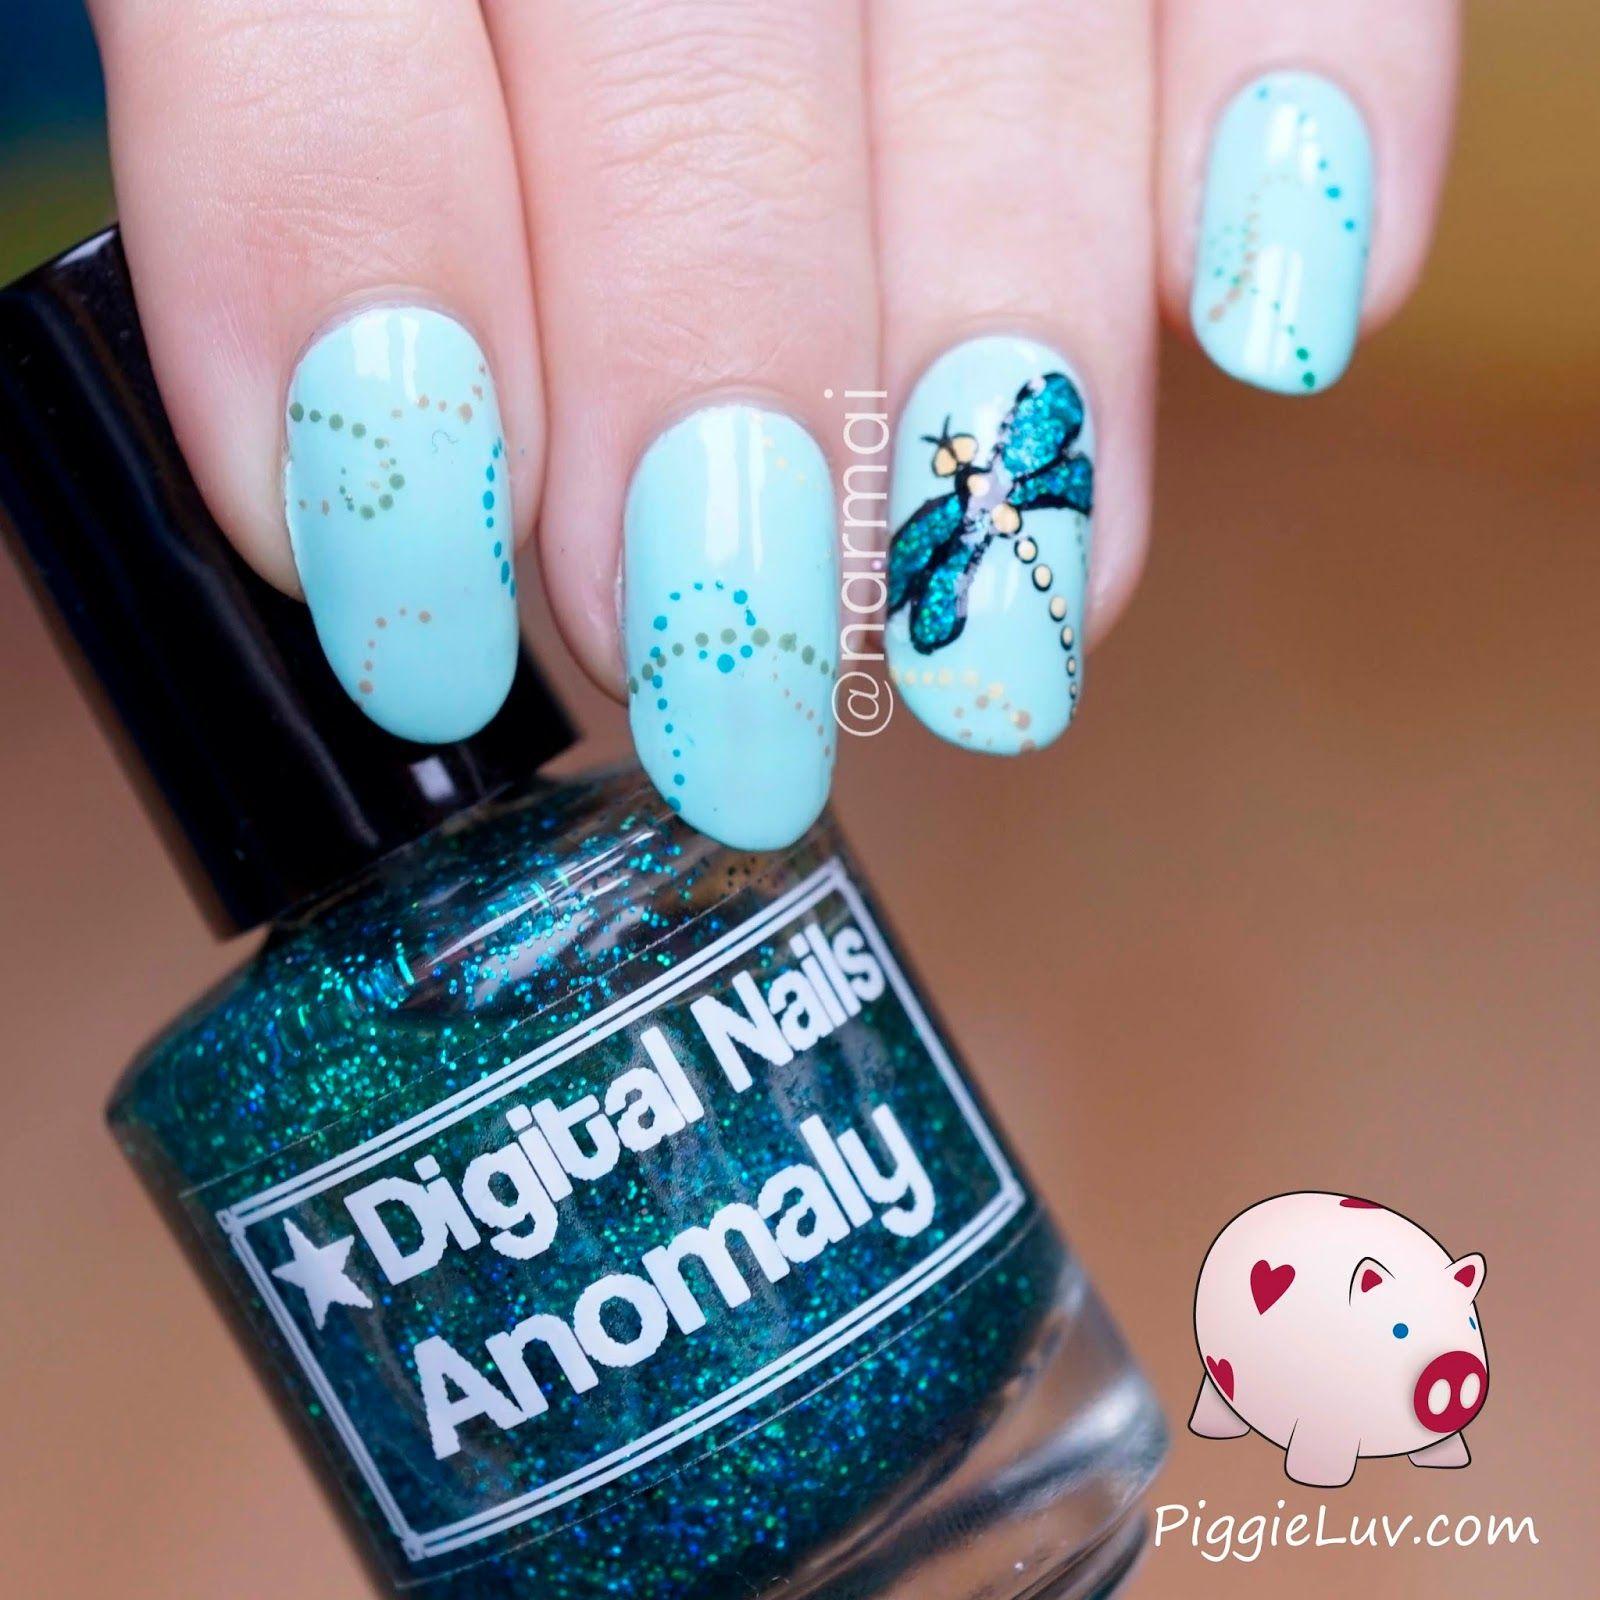 Glitter dragonfly nail art | Makeup sponges, Dragonfly nail art and ...